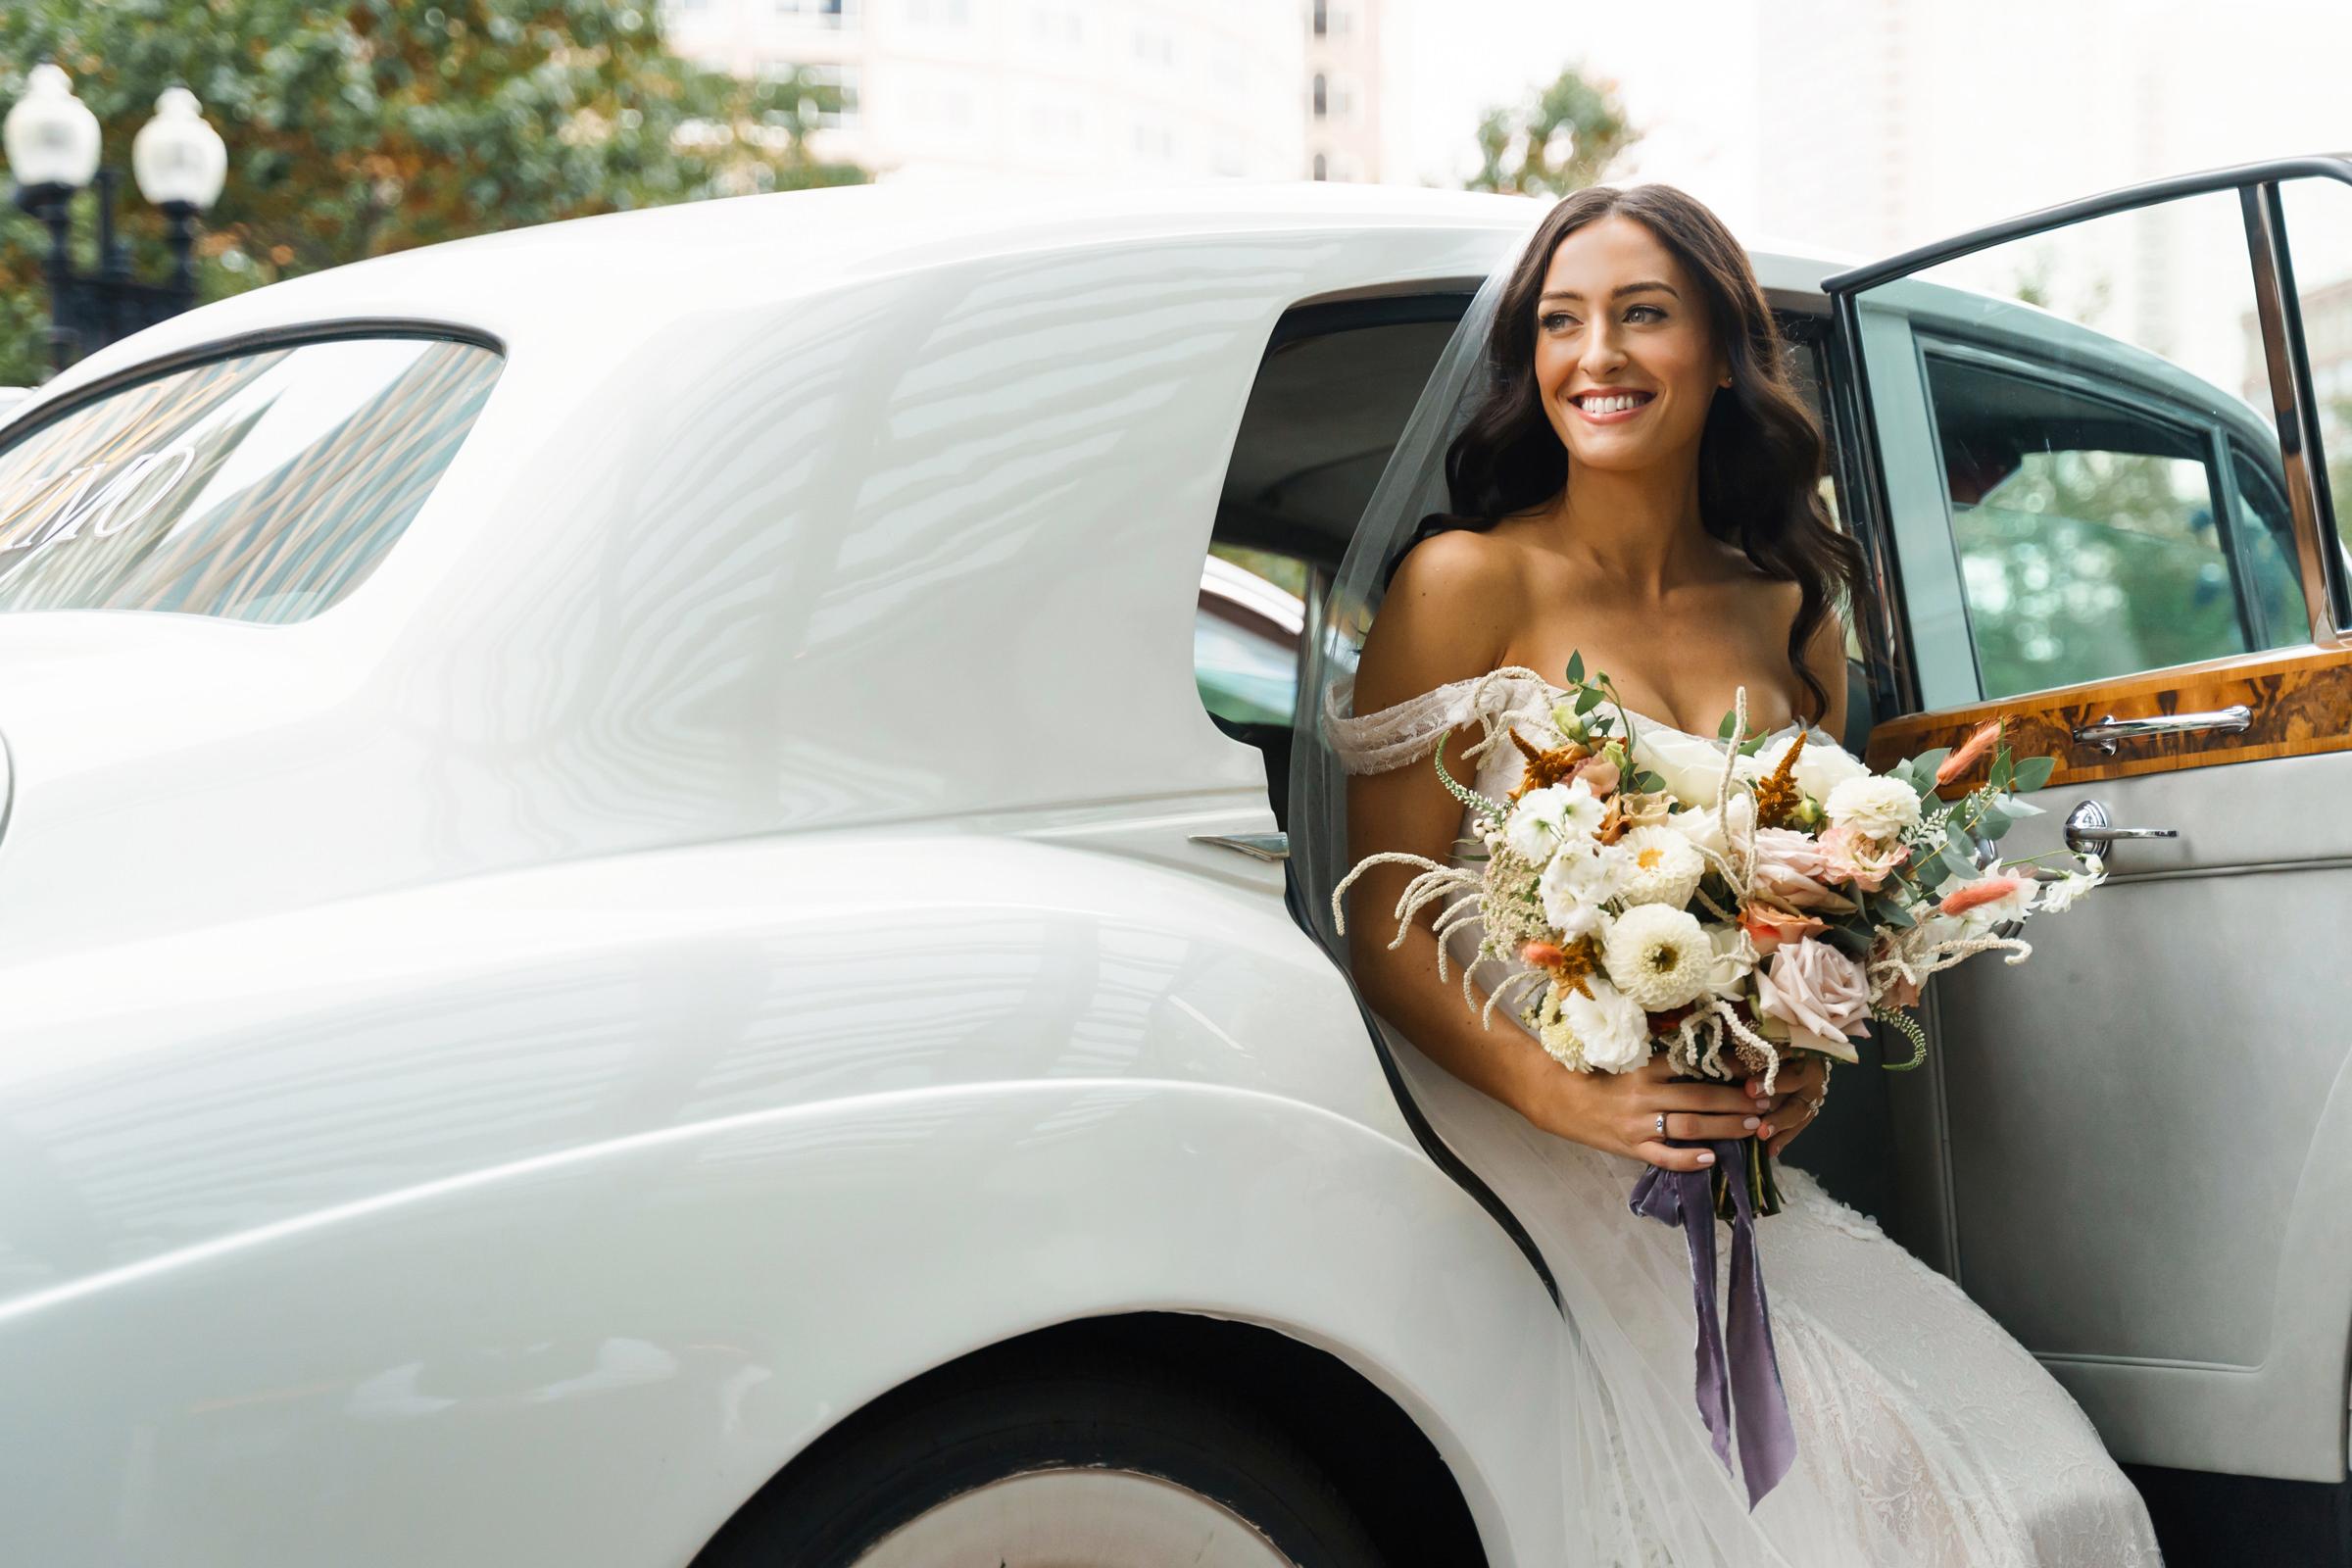 radiant-bride-exiting-white-limo-alex-gordias-photography